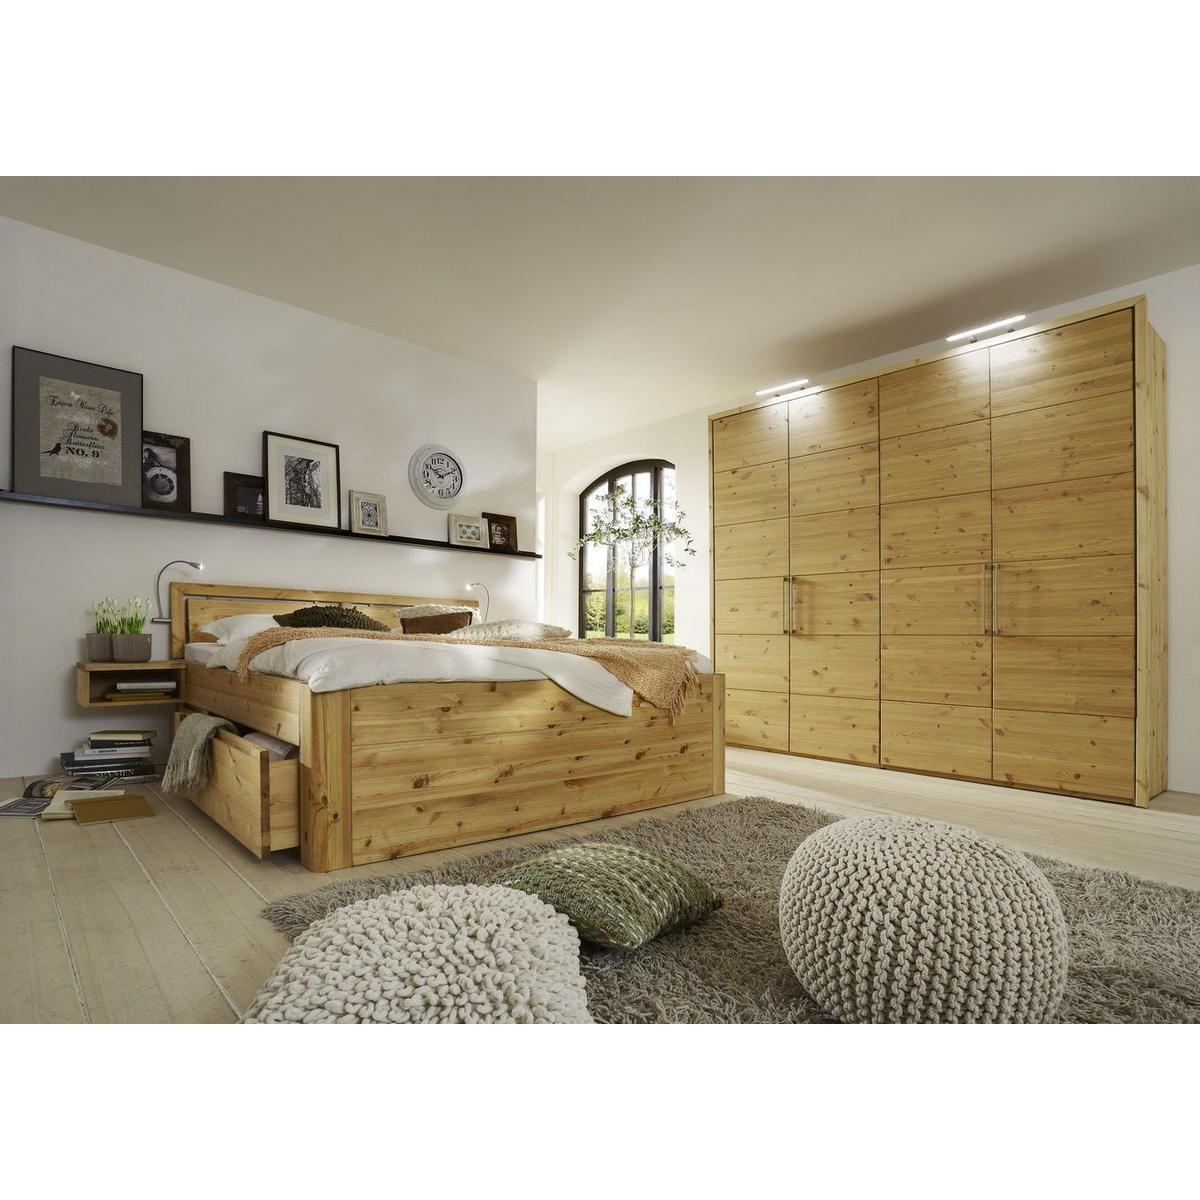 Echtholz Schlafzimmer set 4-teilig kiefer massiv gelaugt geölt GLORIA